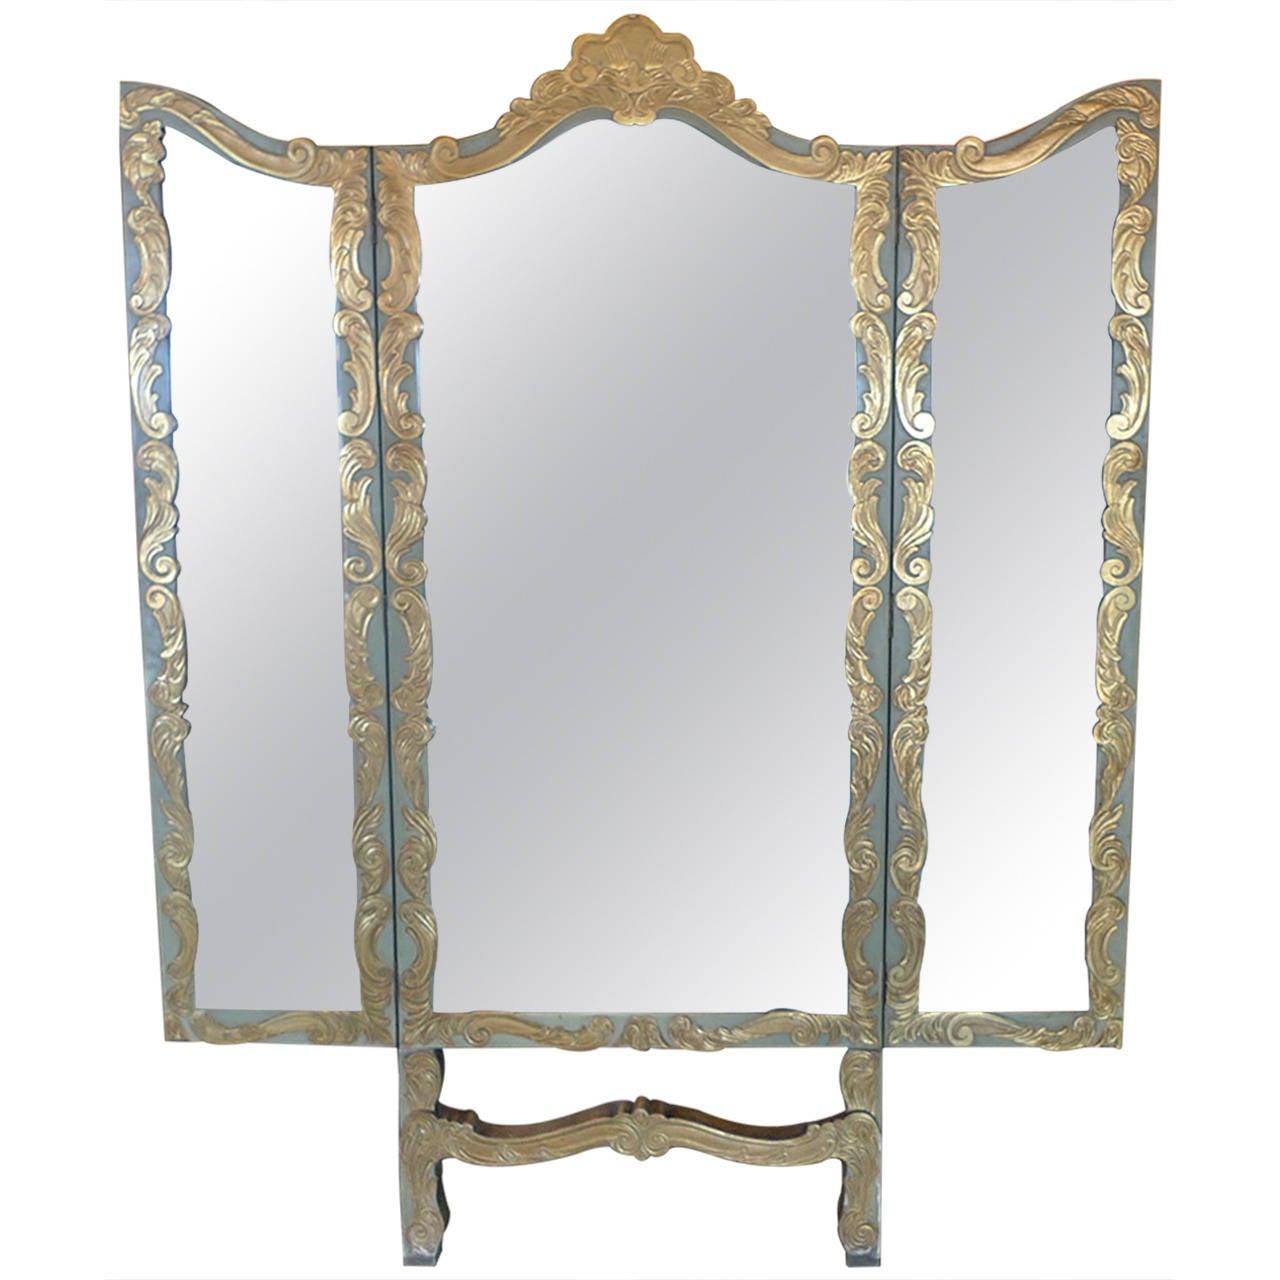 Spanish 19th century folding triptych decorative mirror for Fancy floor mirrors